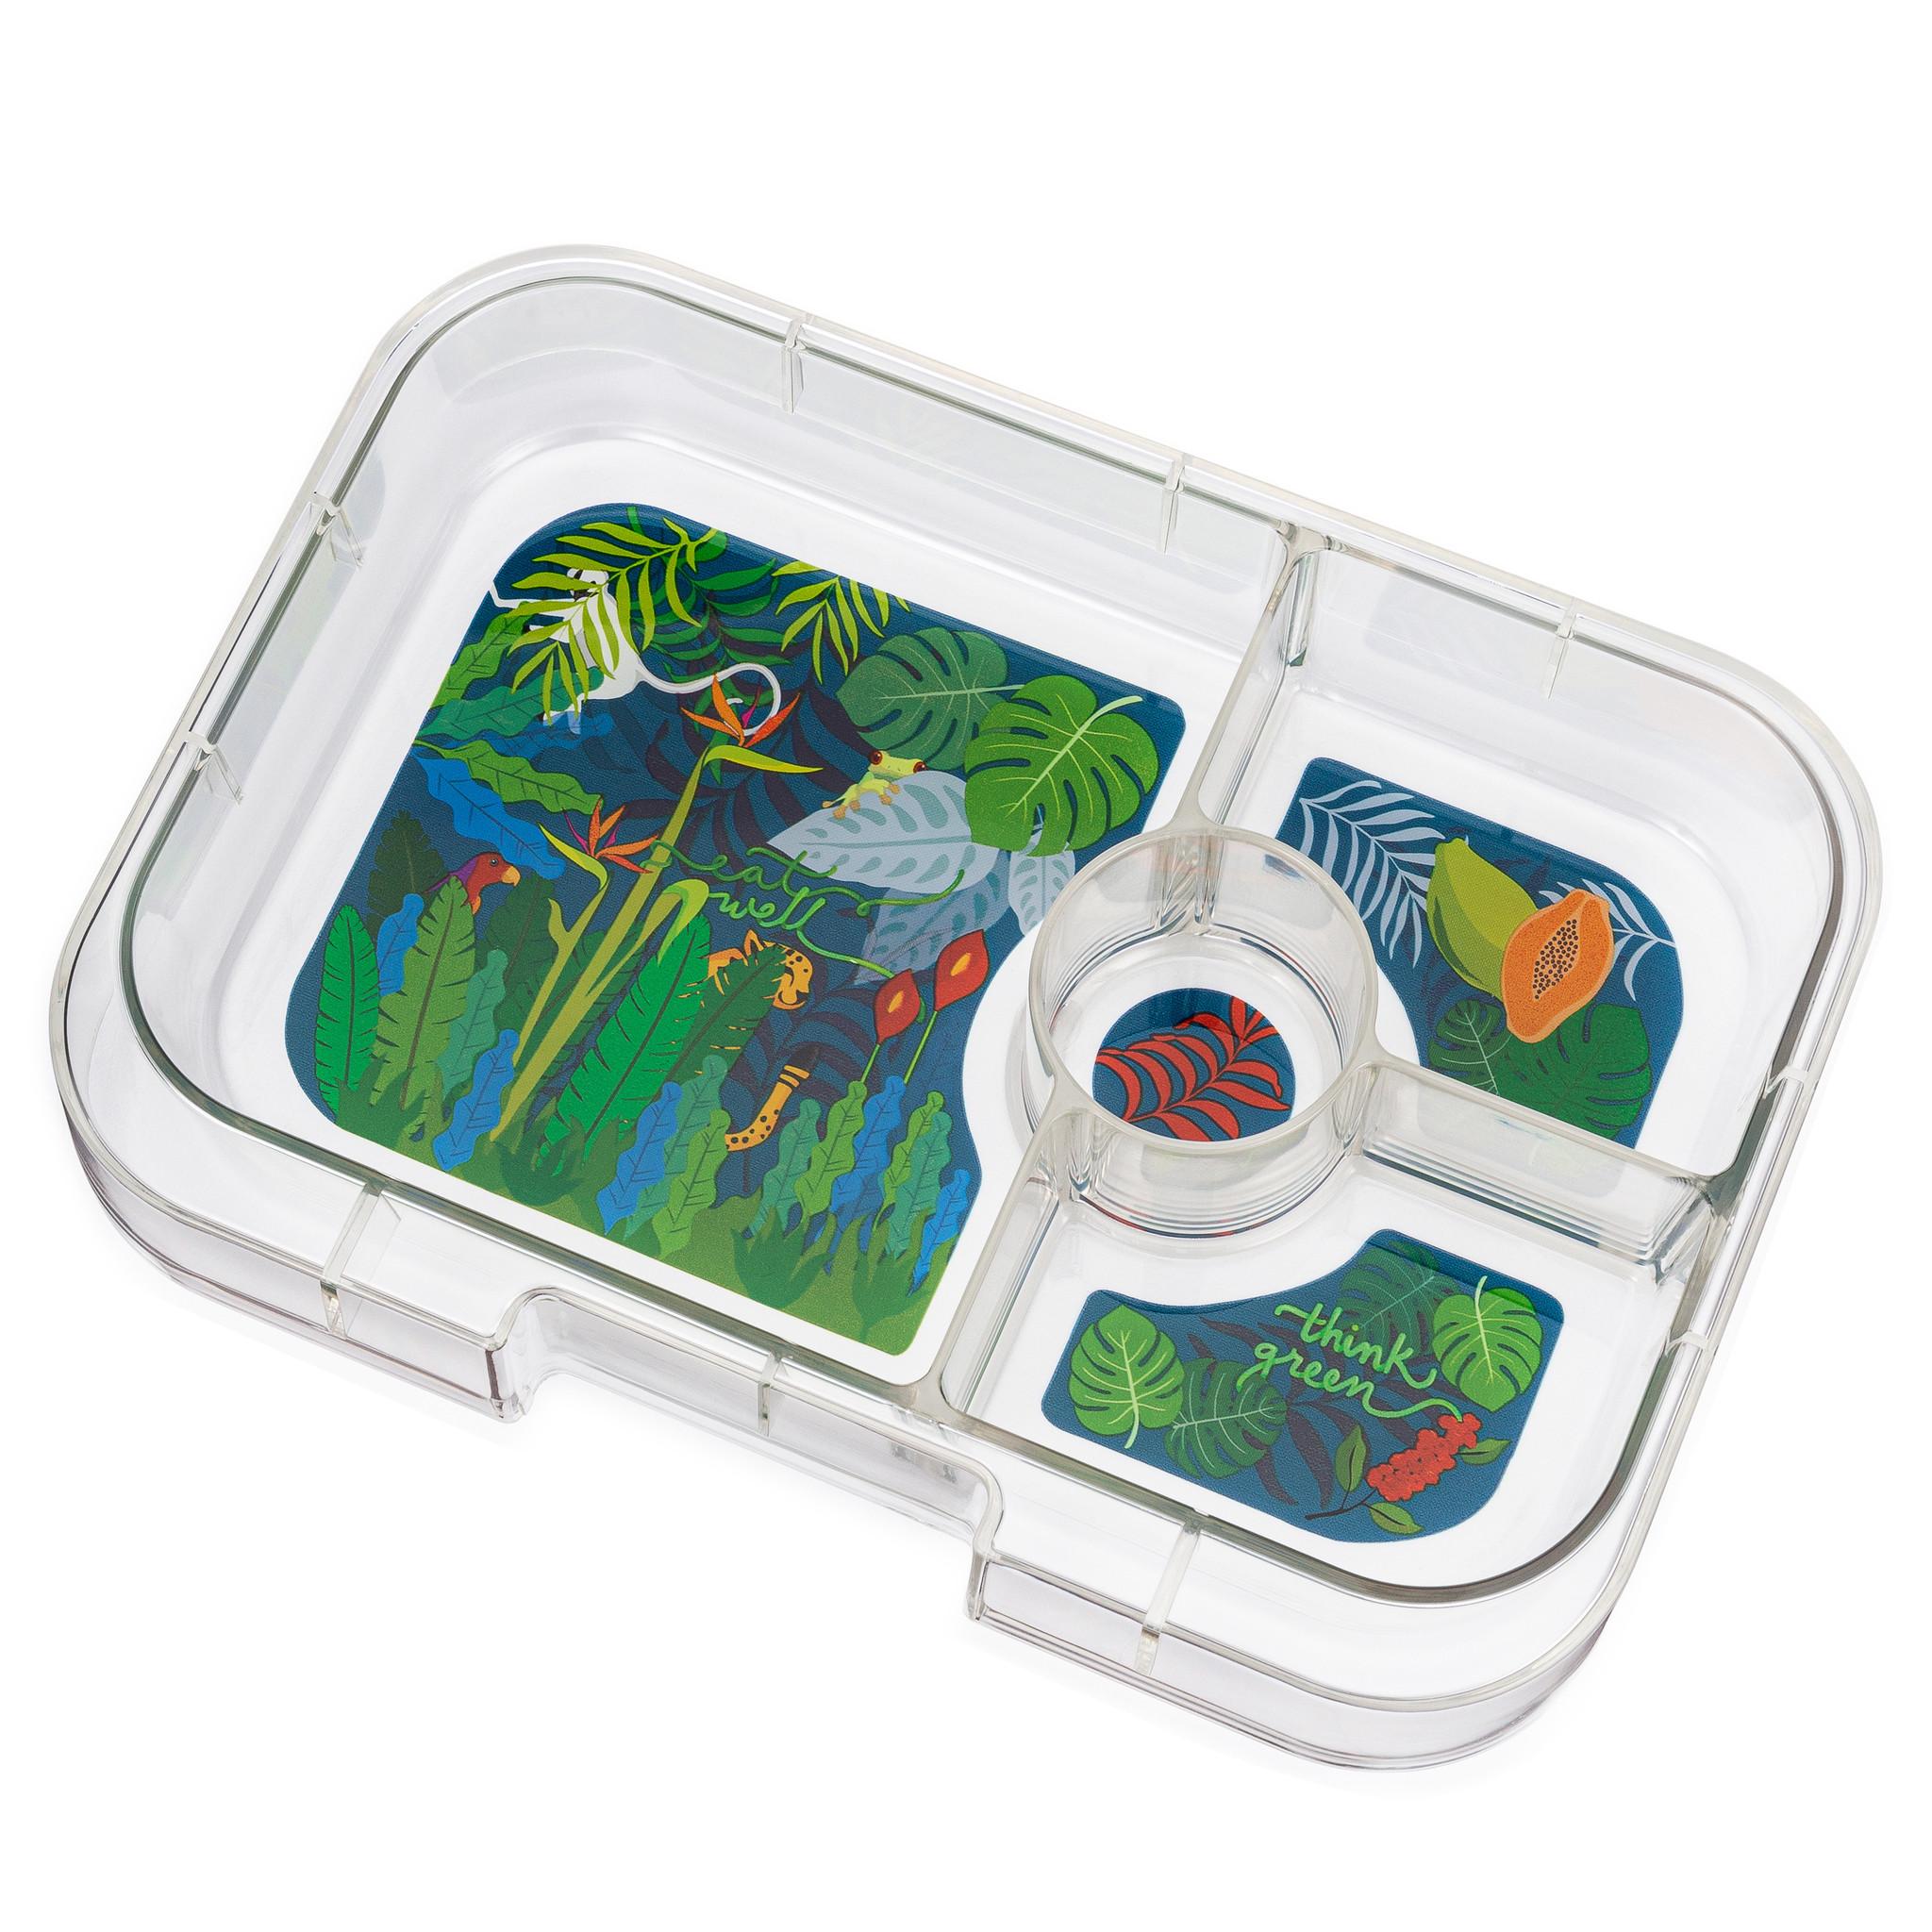 Yumbox Panino extra tray 4 sections Jungle-1